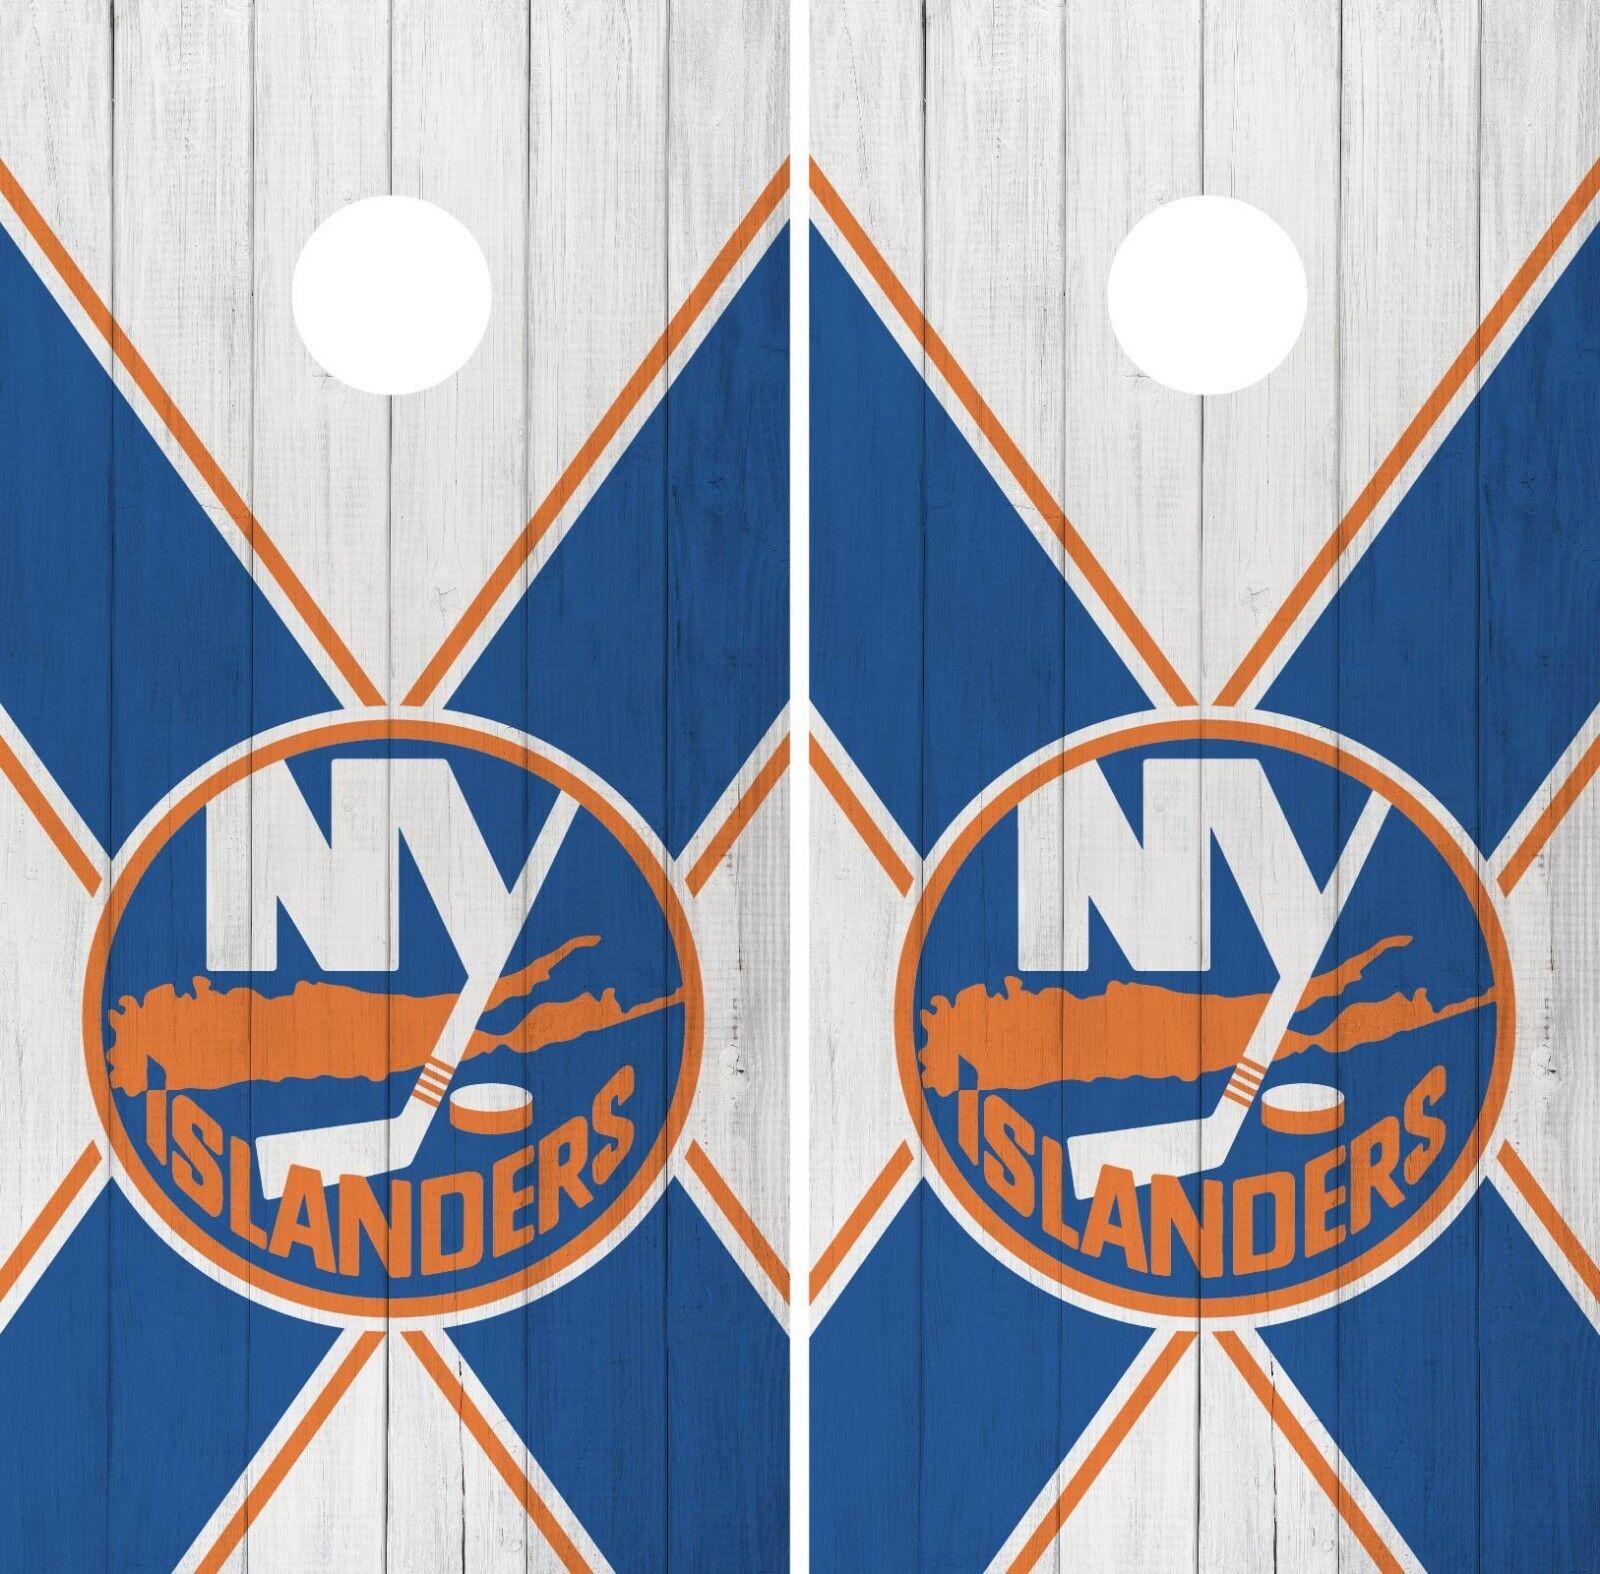 New York Islanders Cornhole Wrap NHL Logo Game Board Skin Set Vinyl Decal CO241